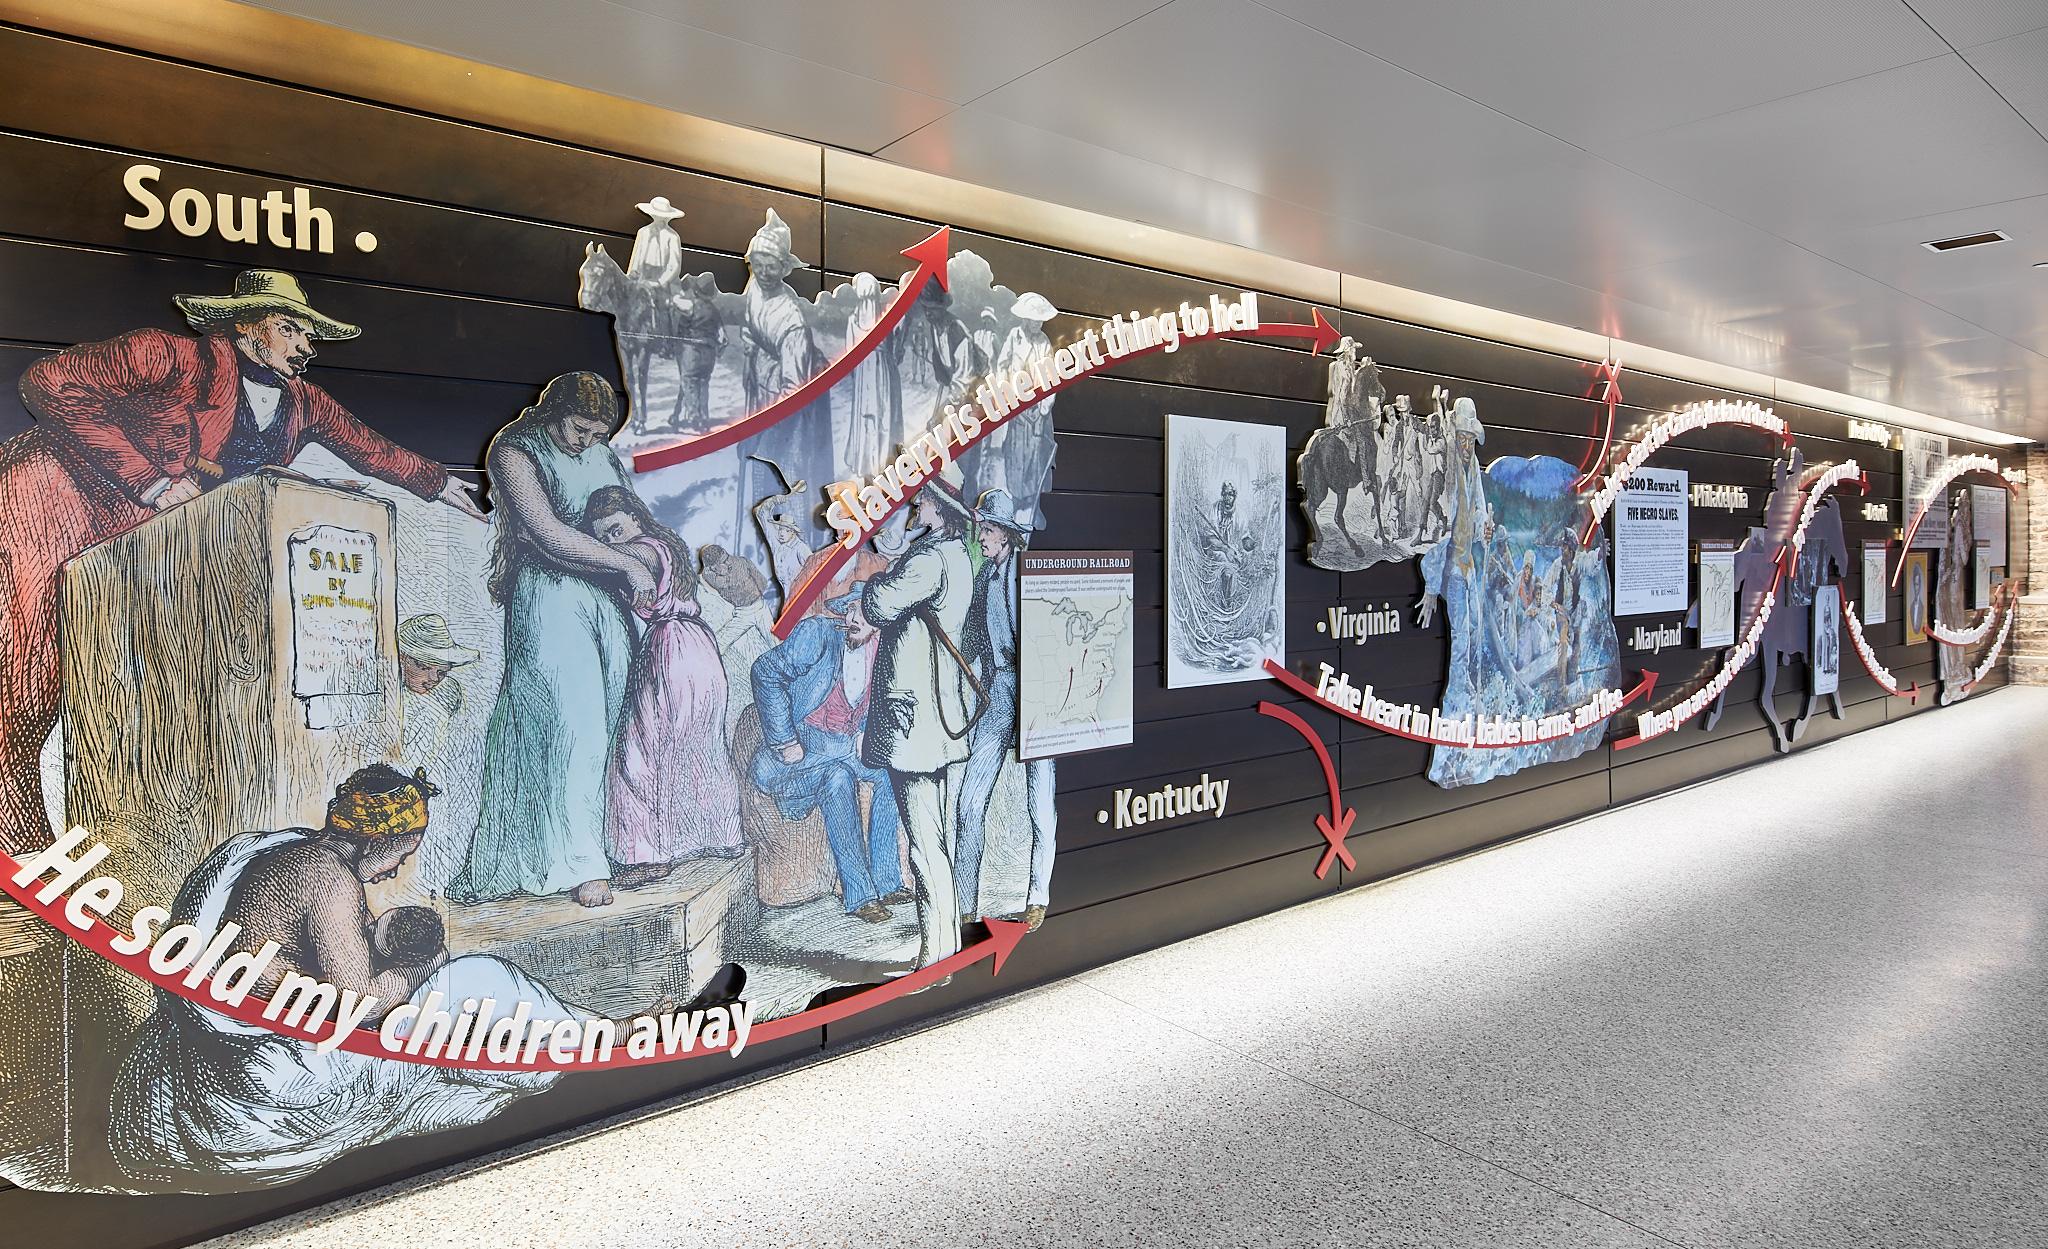 Figure 1. Underground Railroad historical overview wall and gathering area. Niagara FallsUnderground Railroad Heritage Center, Amtrak Station Atrium. Photo: Copyright 2018 Kim Smith Photo and Seth Frankel/Studio Tectonic.